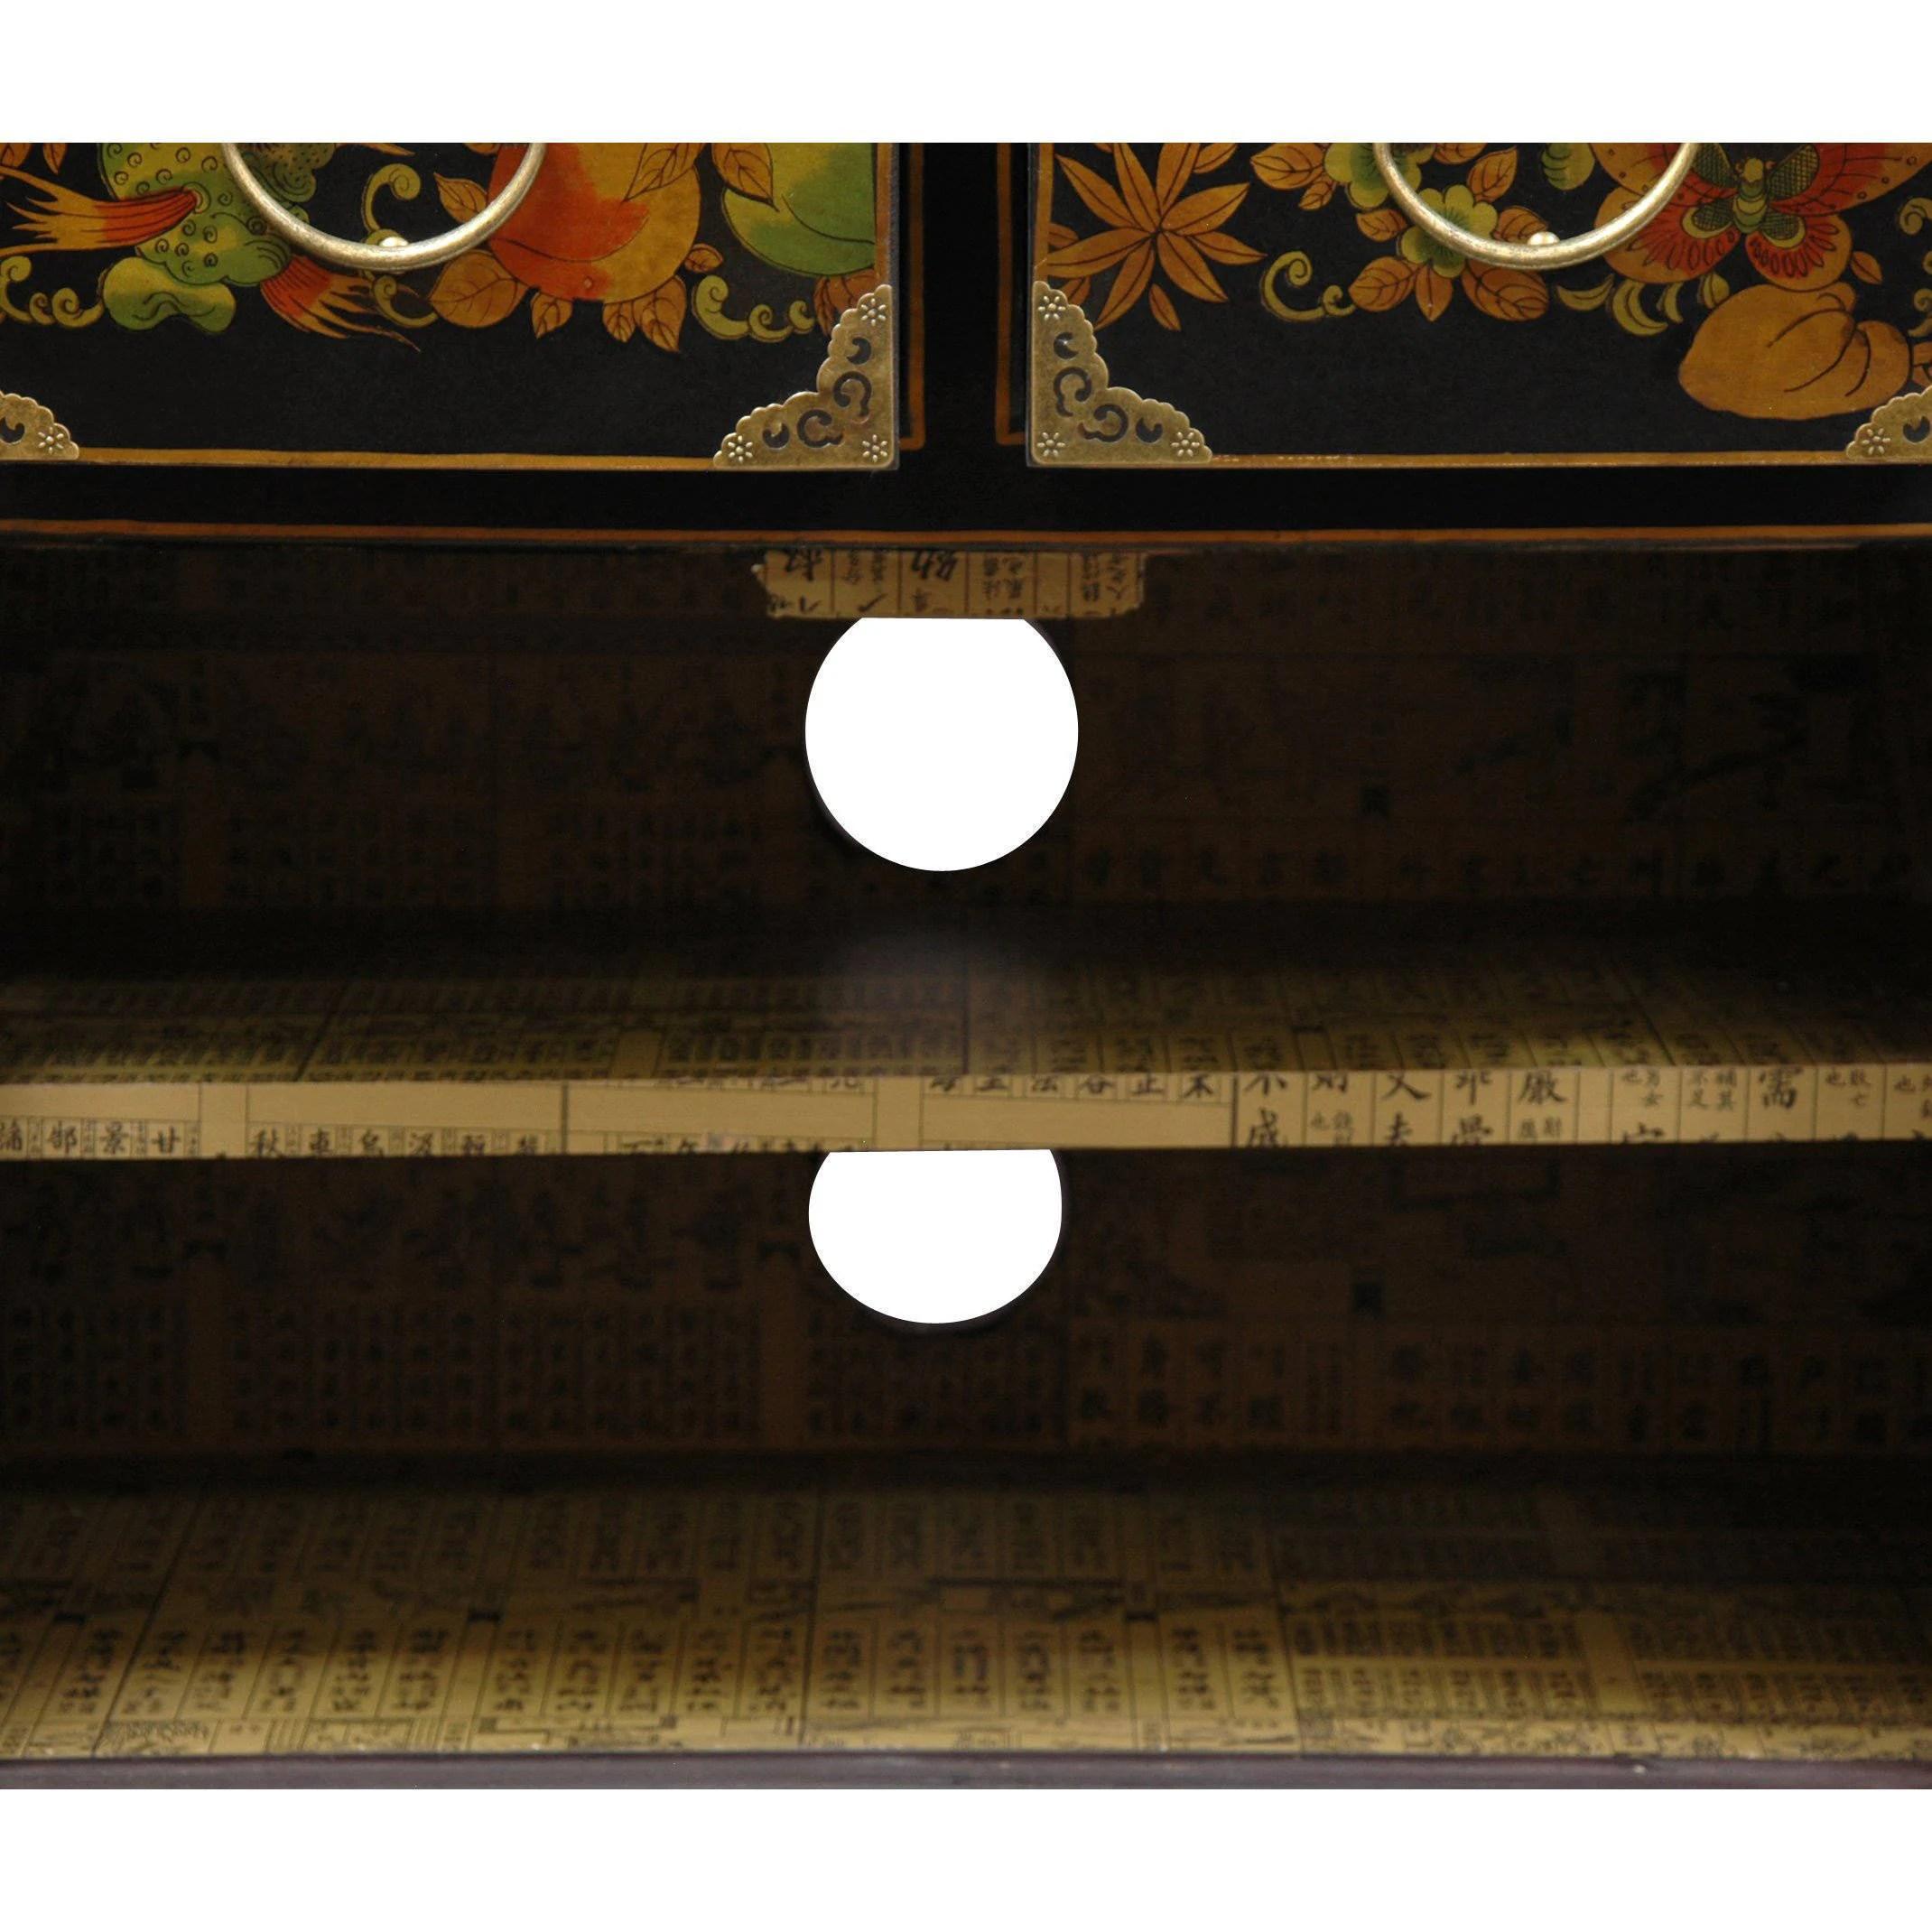 Lacquer Shelf Life